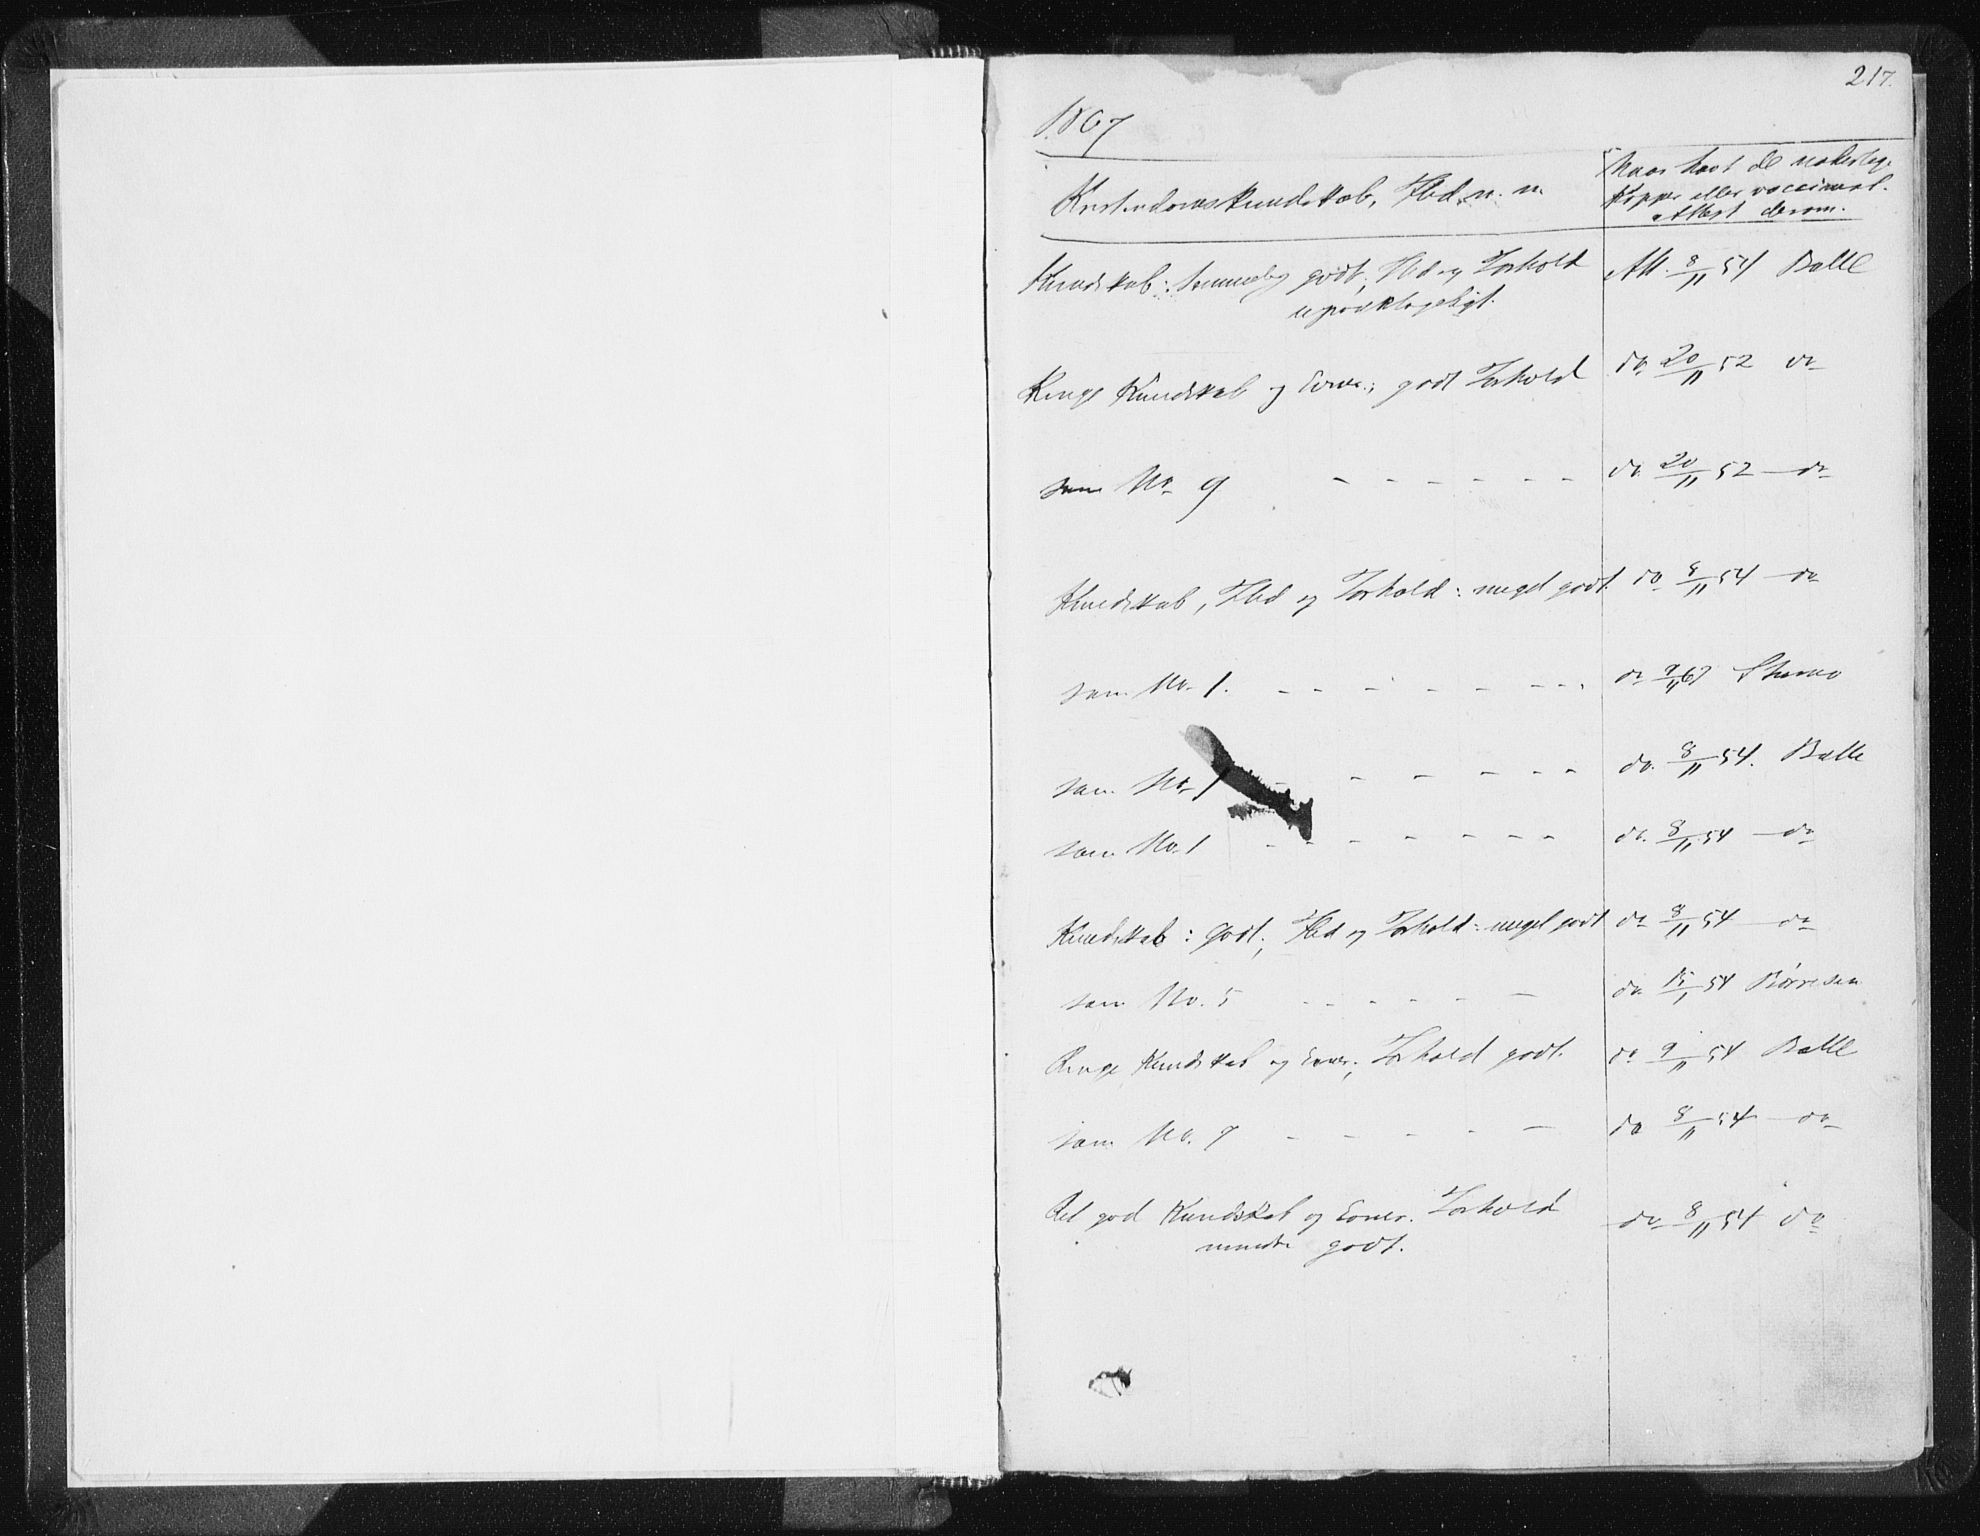 SAST, Vikedal sokneprestkontor, IV: Ministerialbok nr. A 6.2, 1851-1867, s. 217